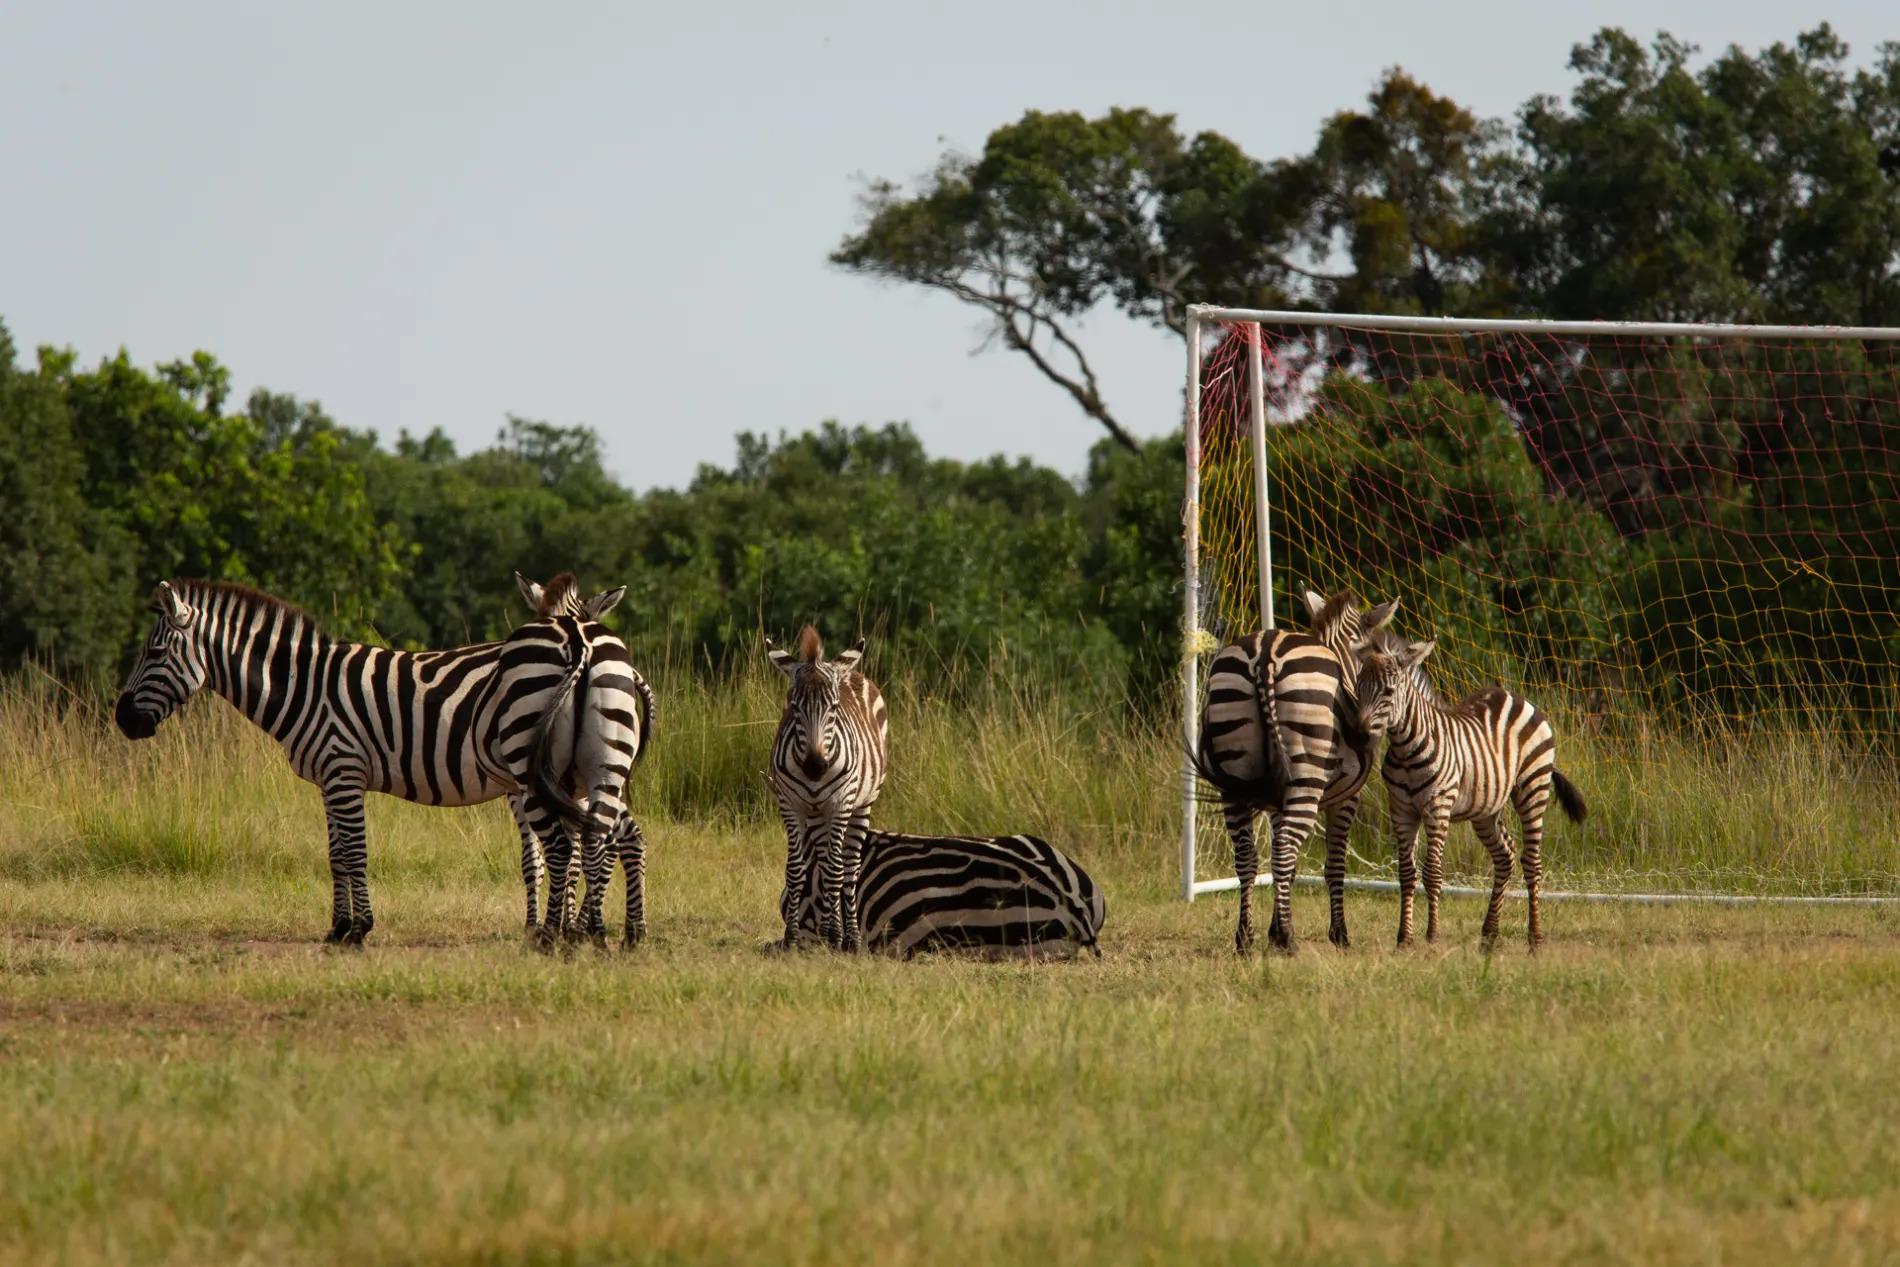 zebra and soccer pitch